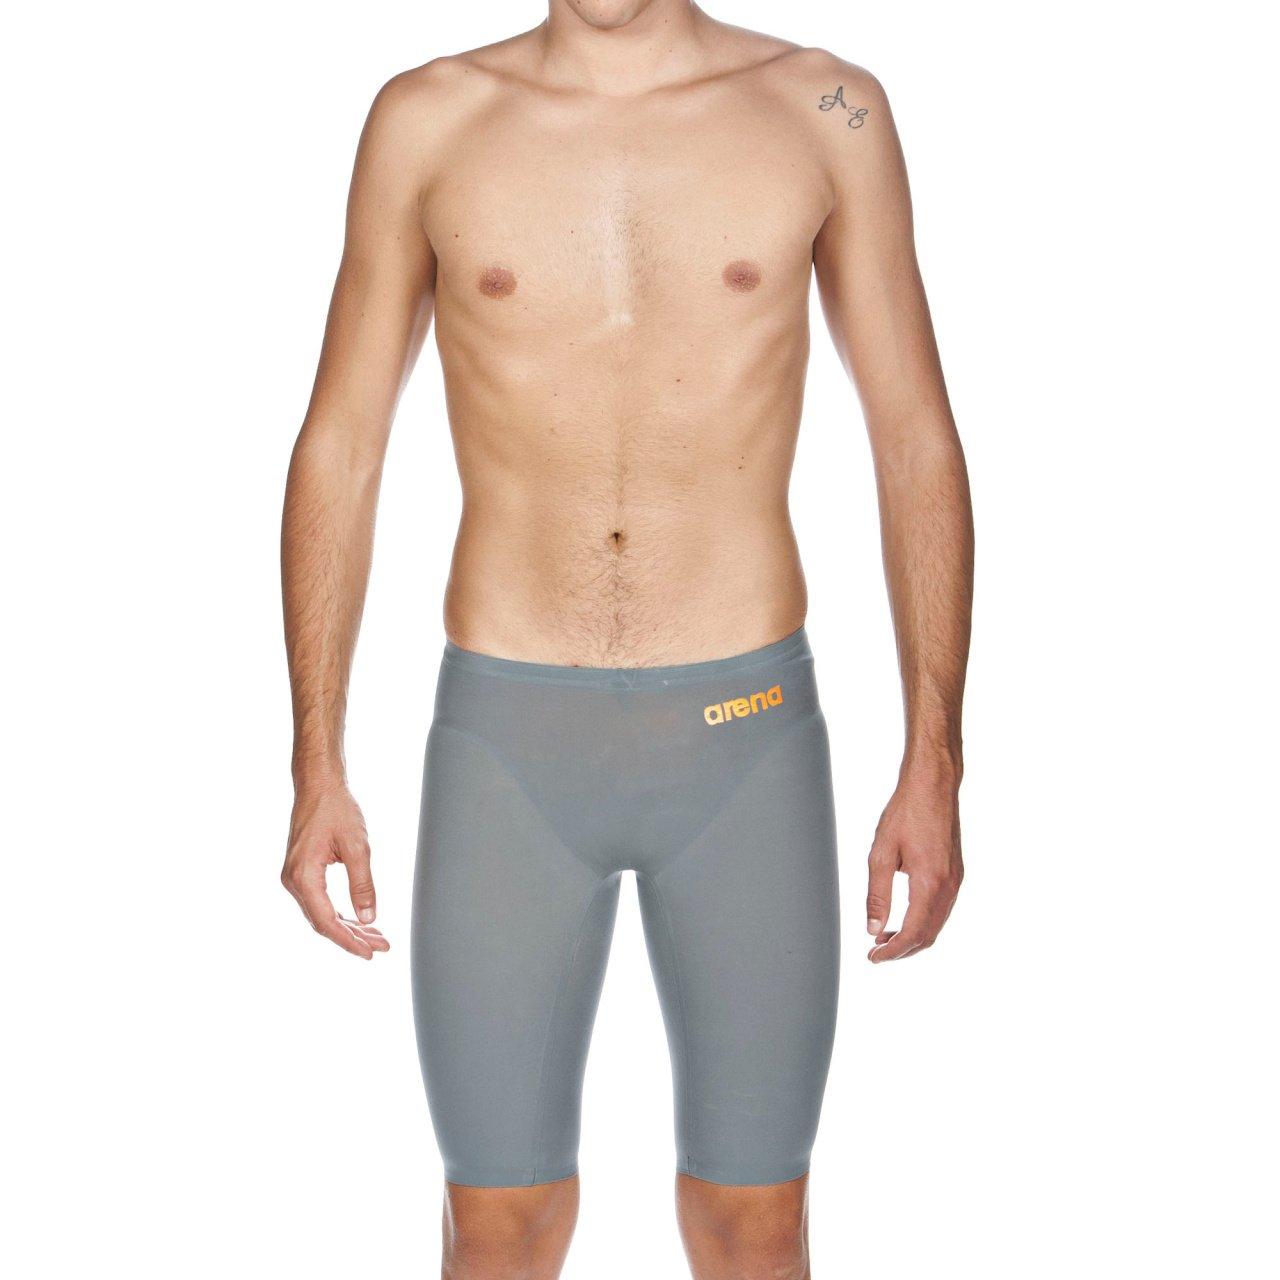 arena Powerskin R-EVO One Men's Jammer Racing Swimsuit, Grey / Bright Orange, 28 by ARENA